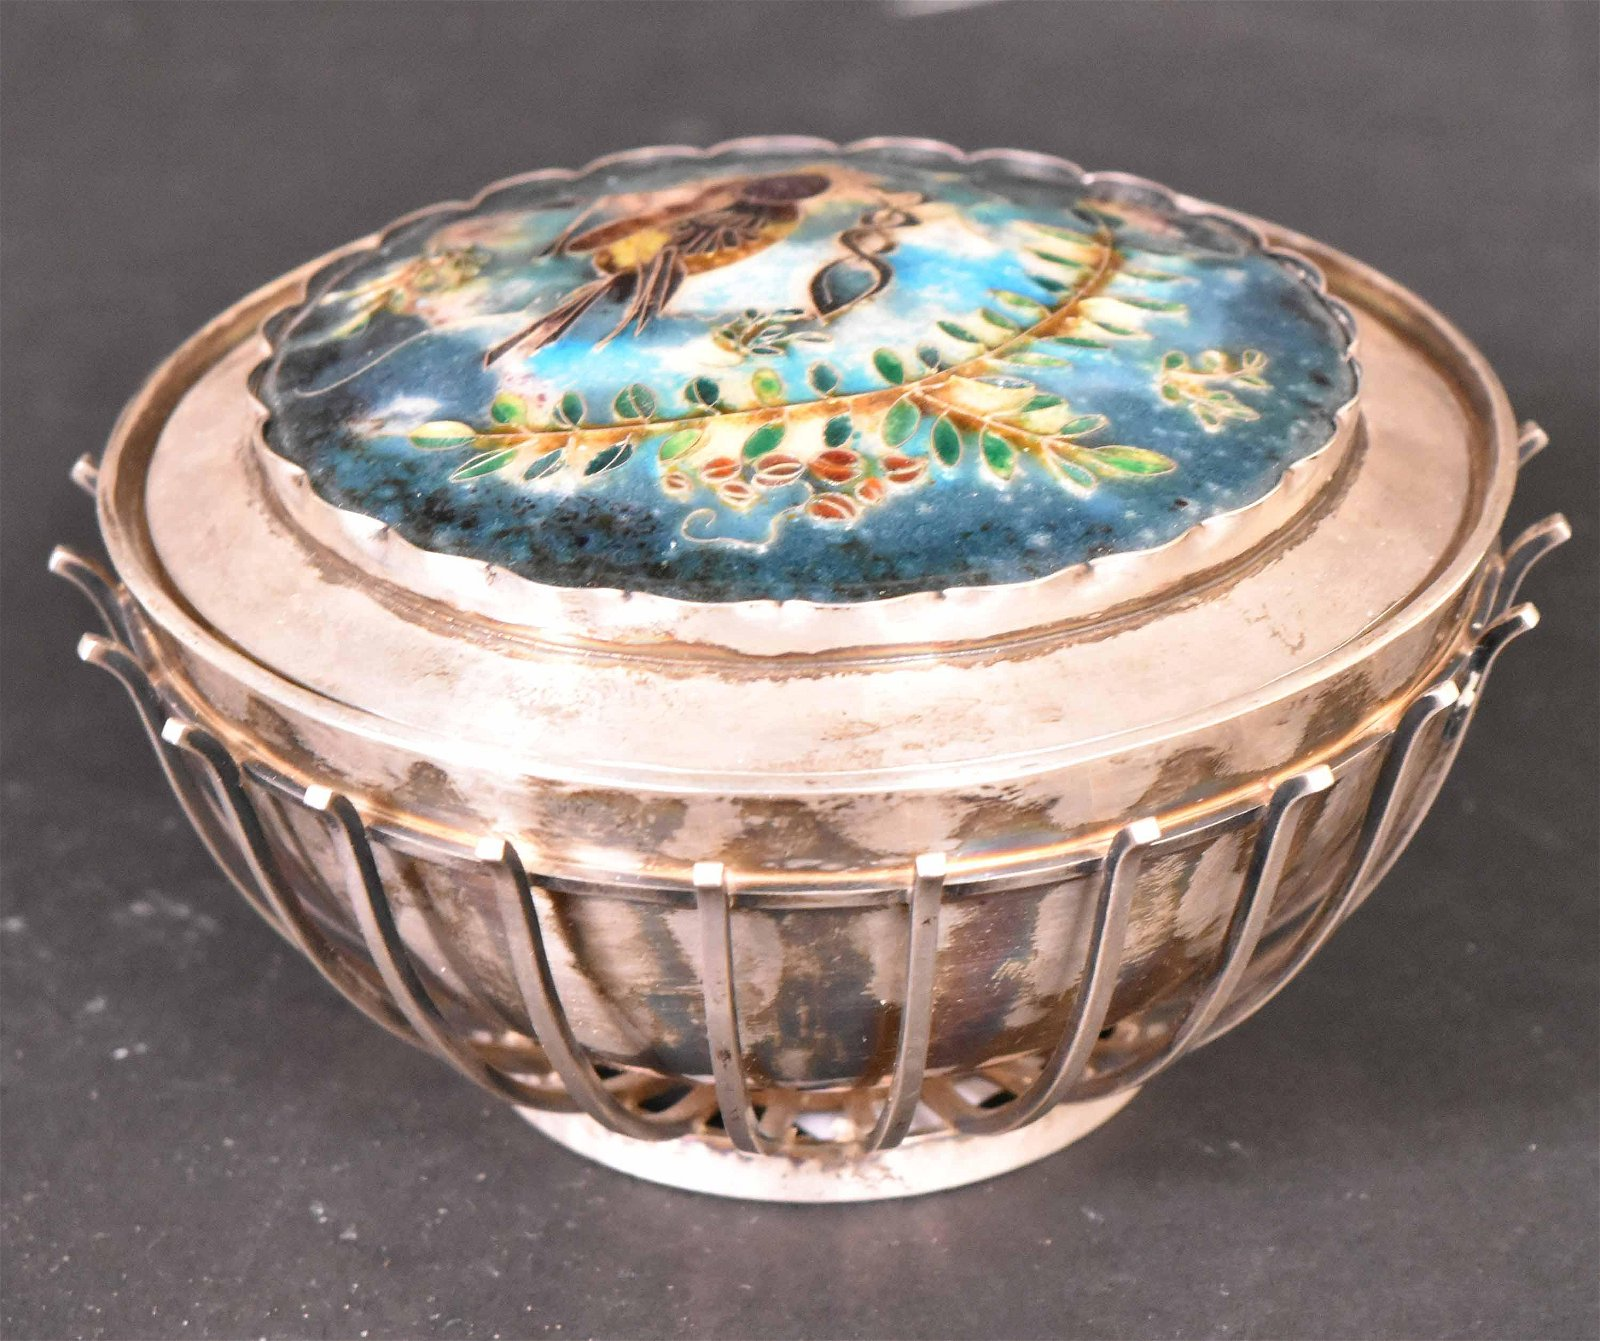 German Silver & Enameled Hardstone Covered Bowl